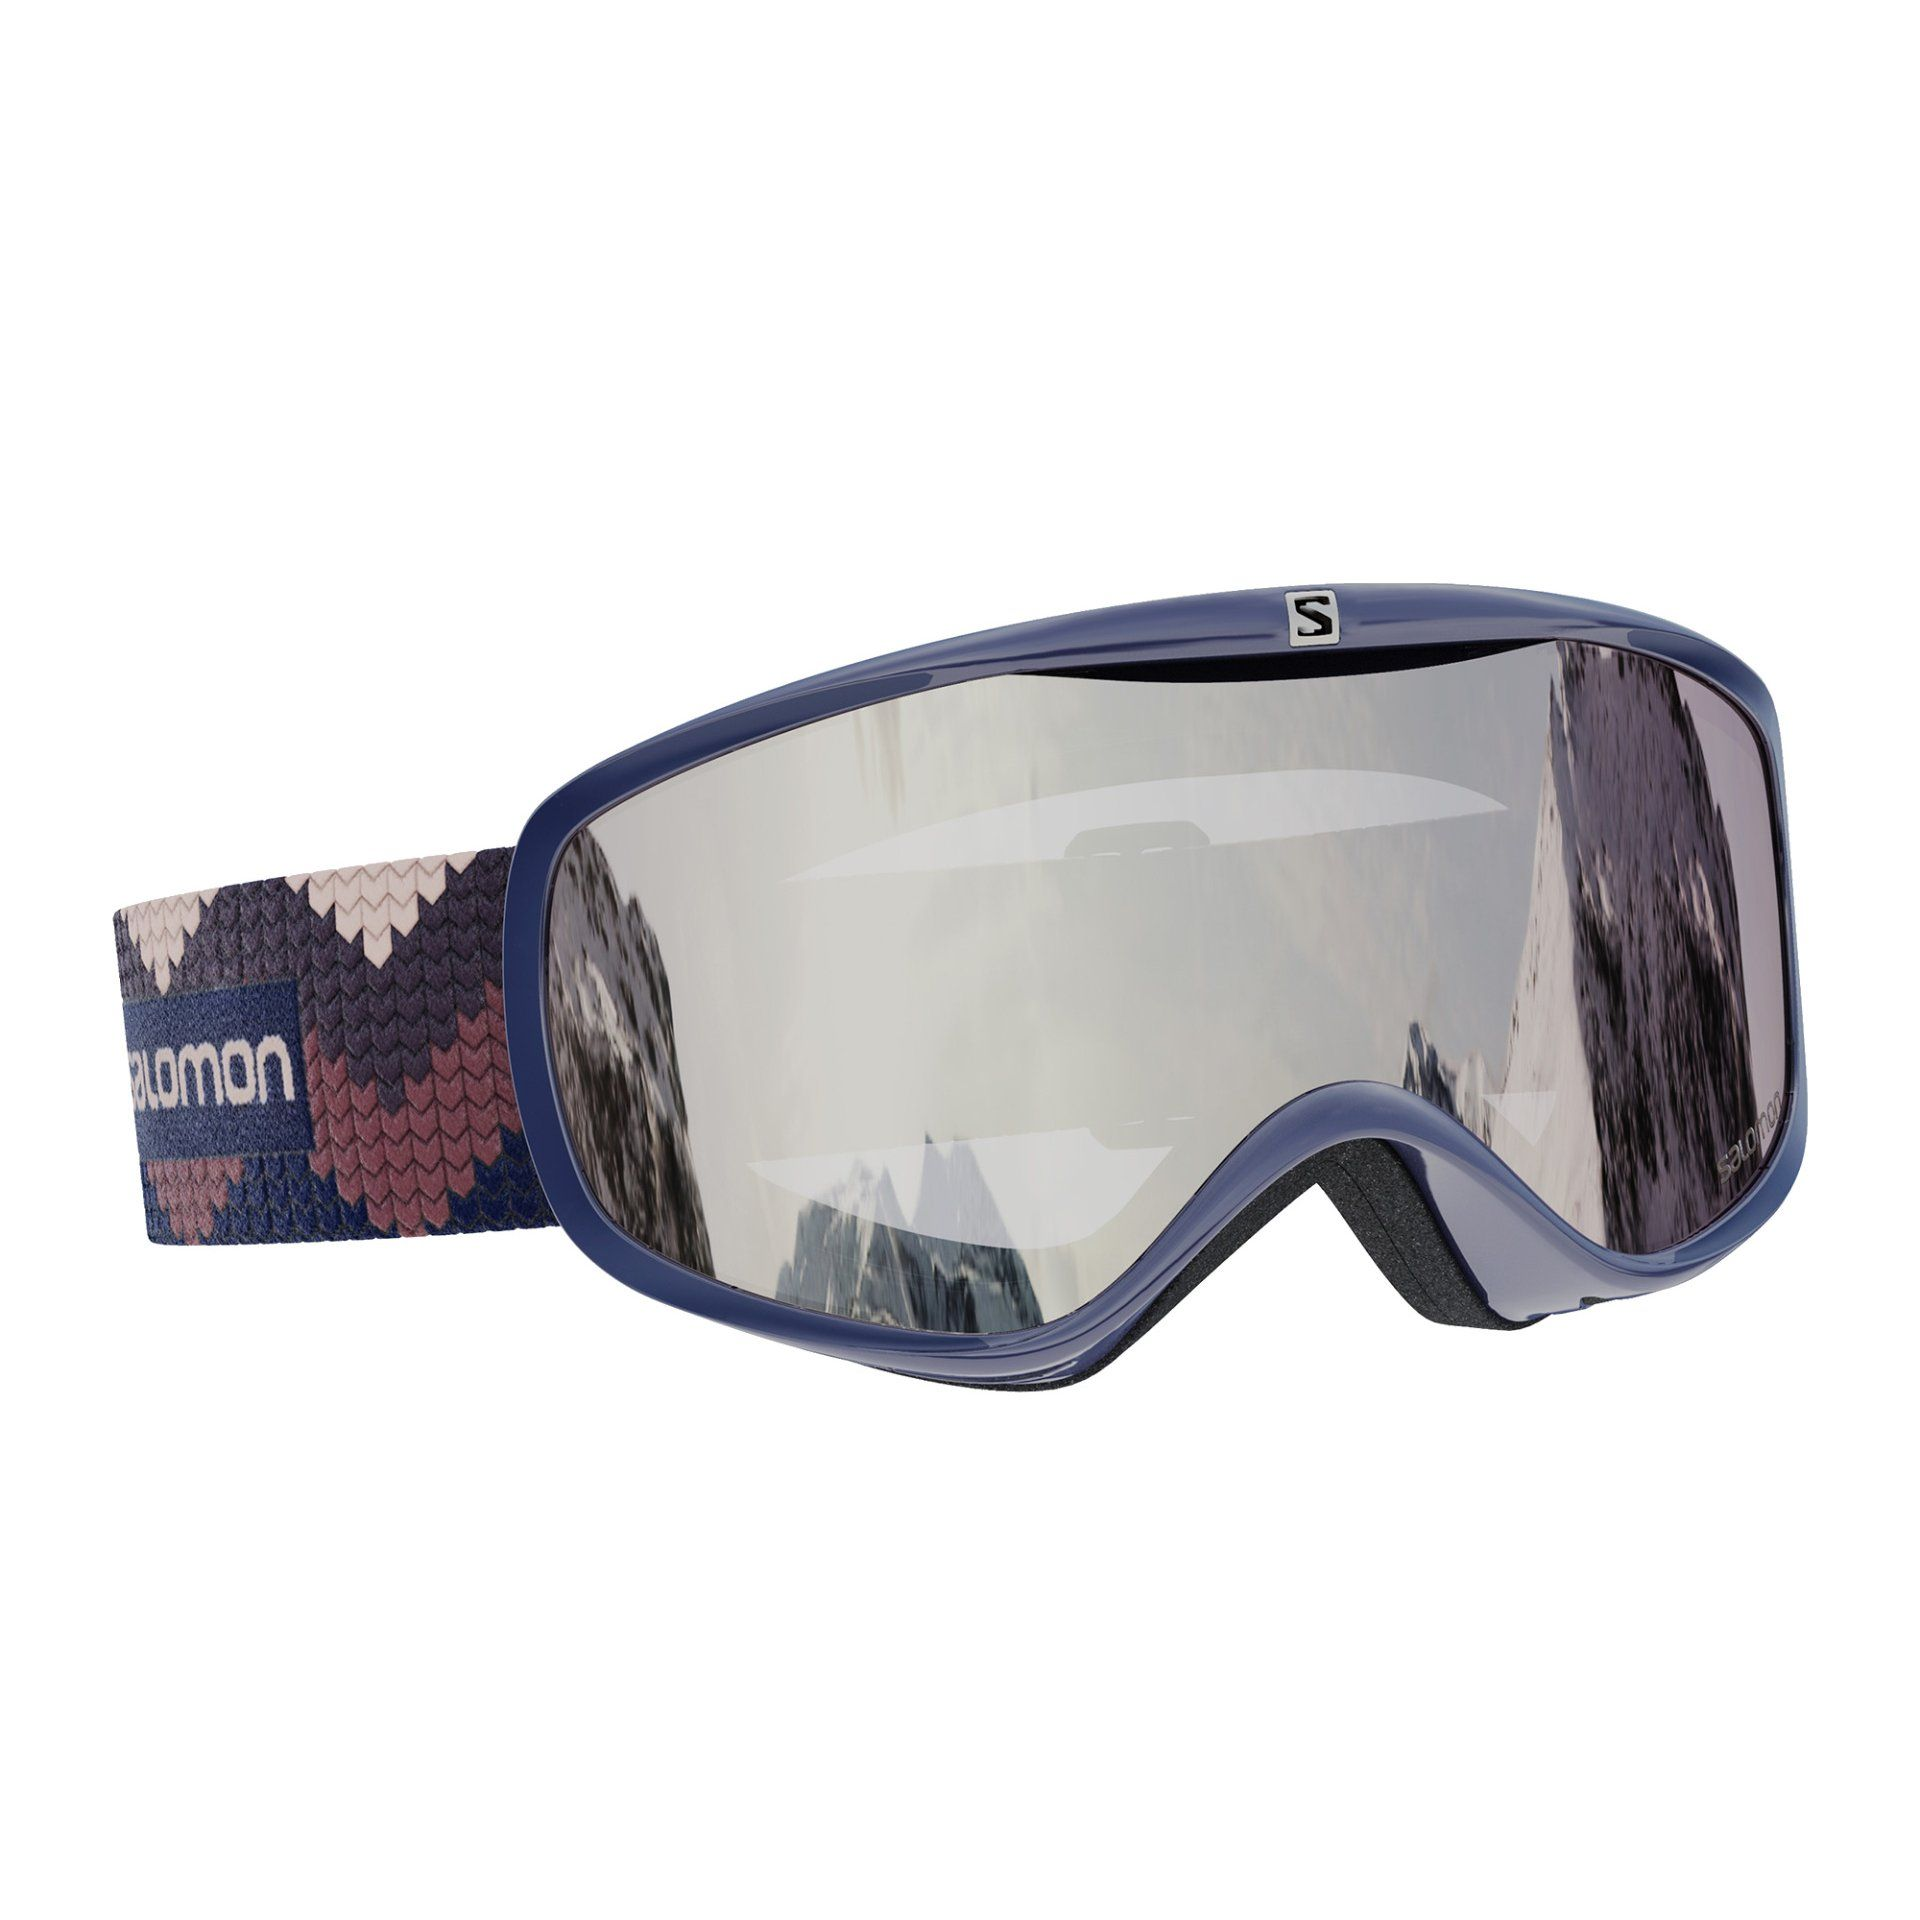 GOGLE SALOMON SENSE WISTERIA|SUPER WHITE L41149600